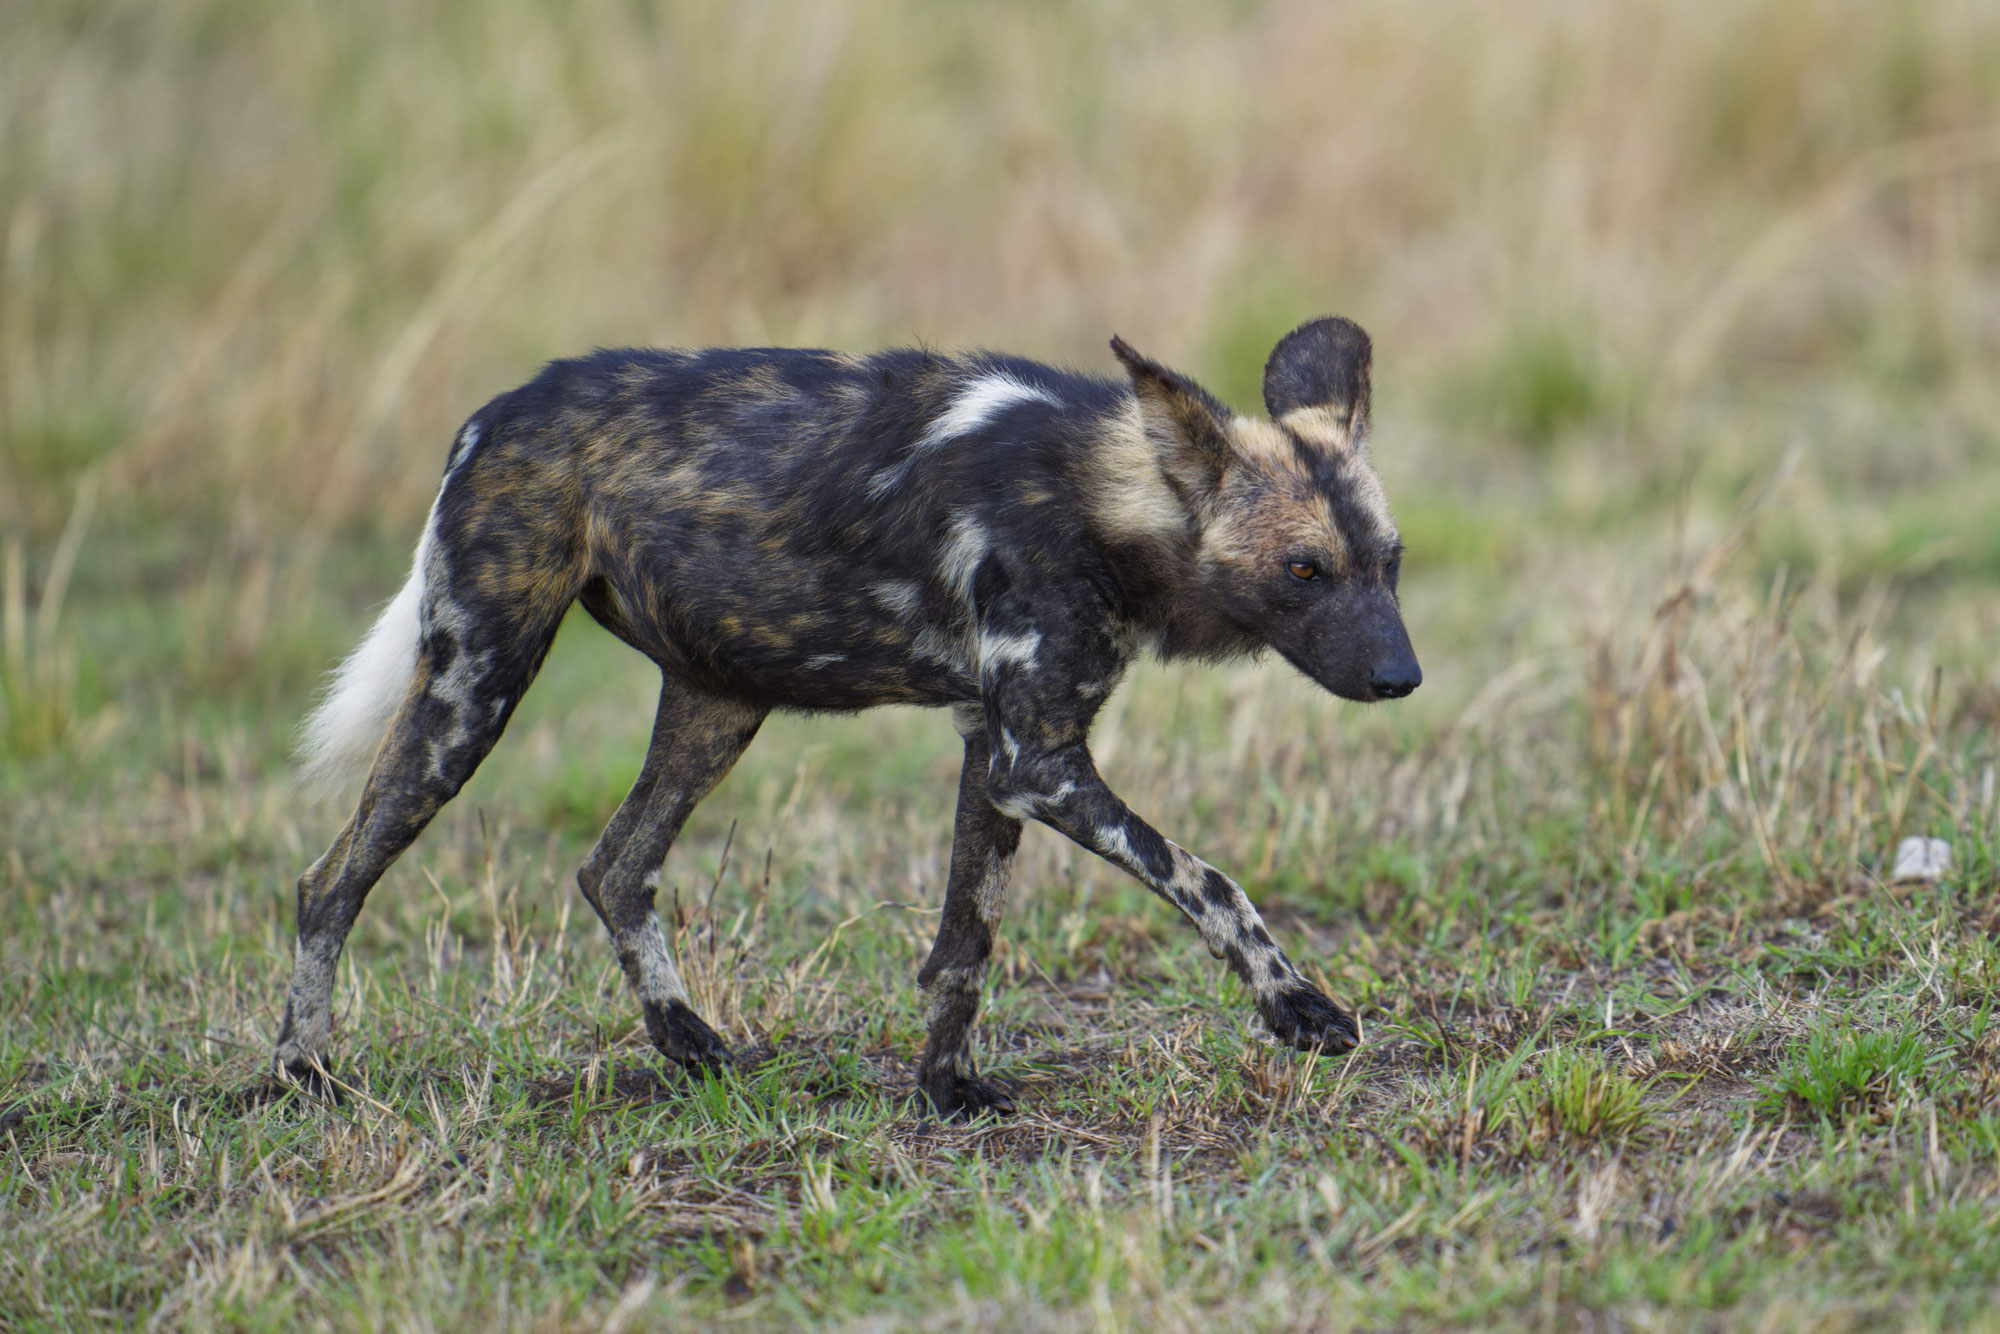 Maasai Mara Sommer 2021 - Wildhunde in der Maasai Mara